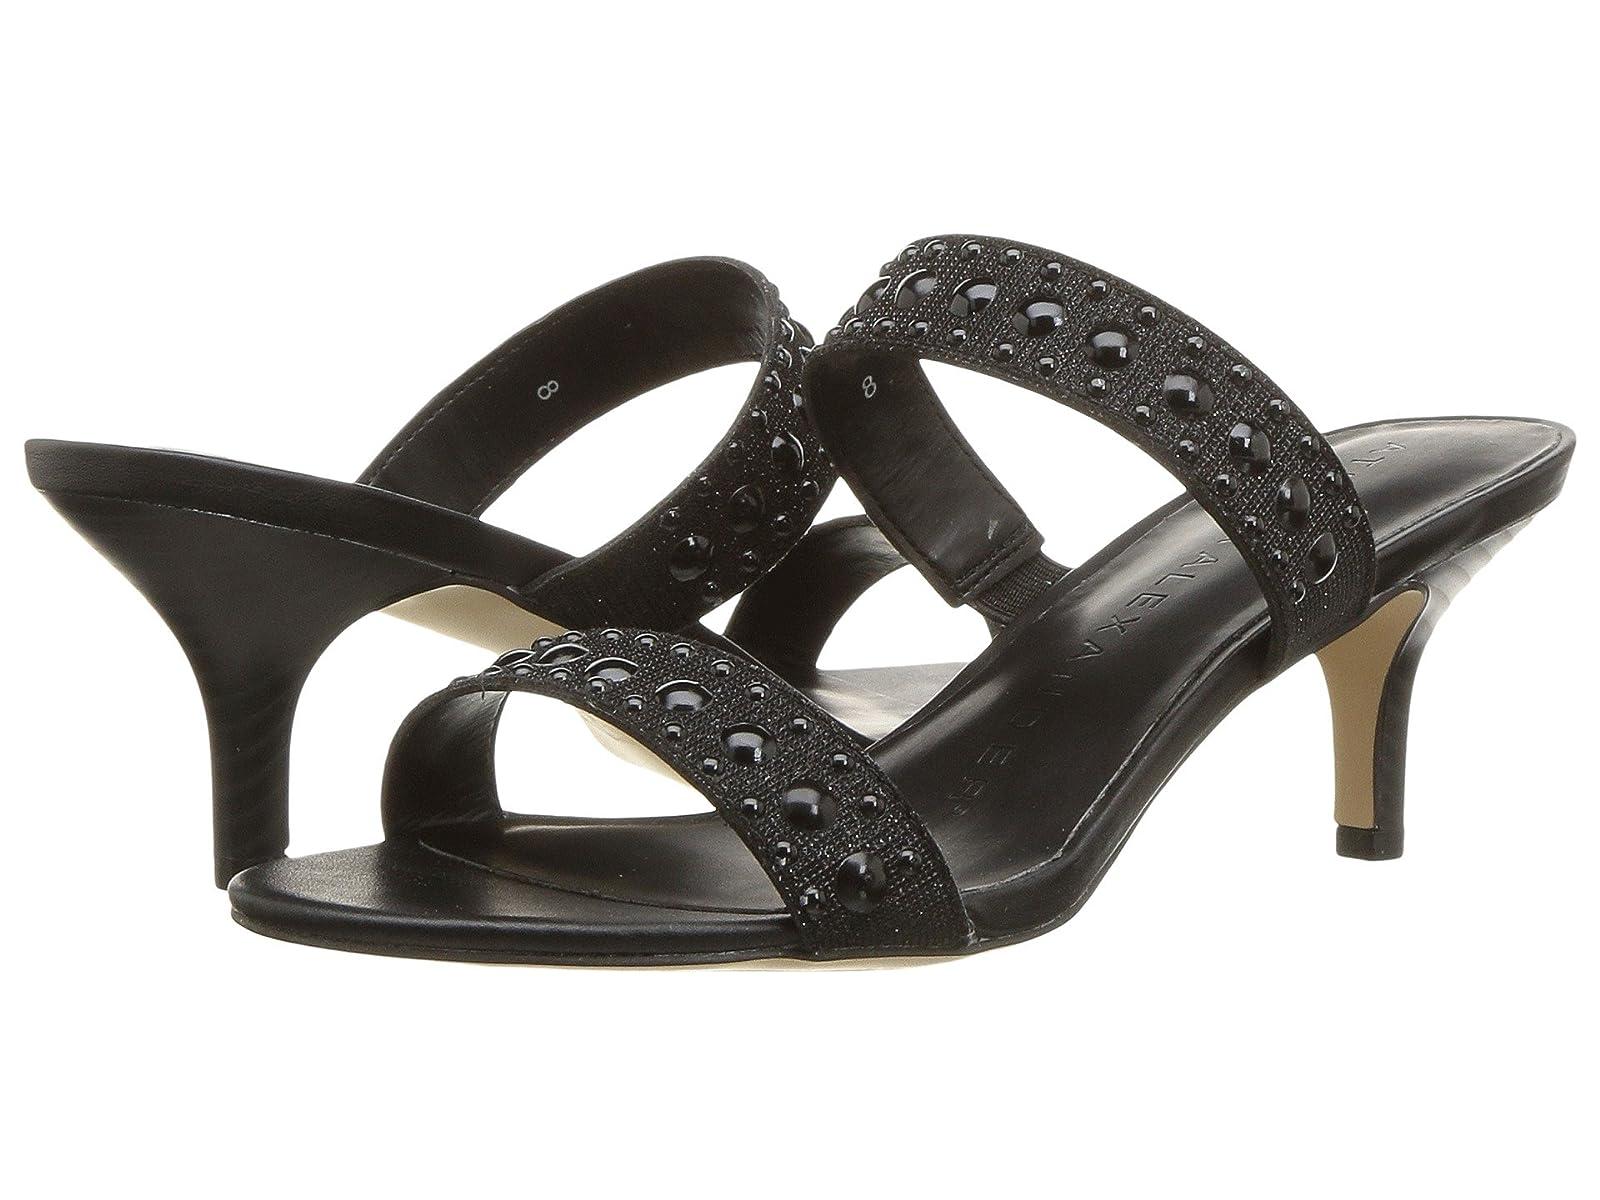 Athena Alexander JettieAtmospheric grades have affordable shoes